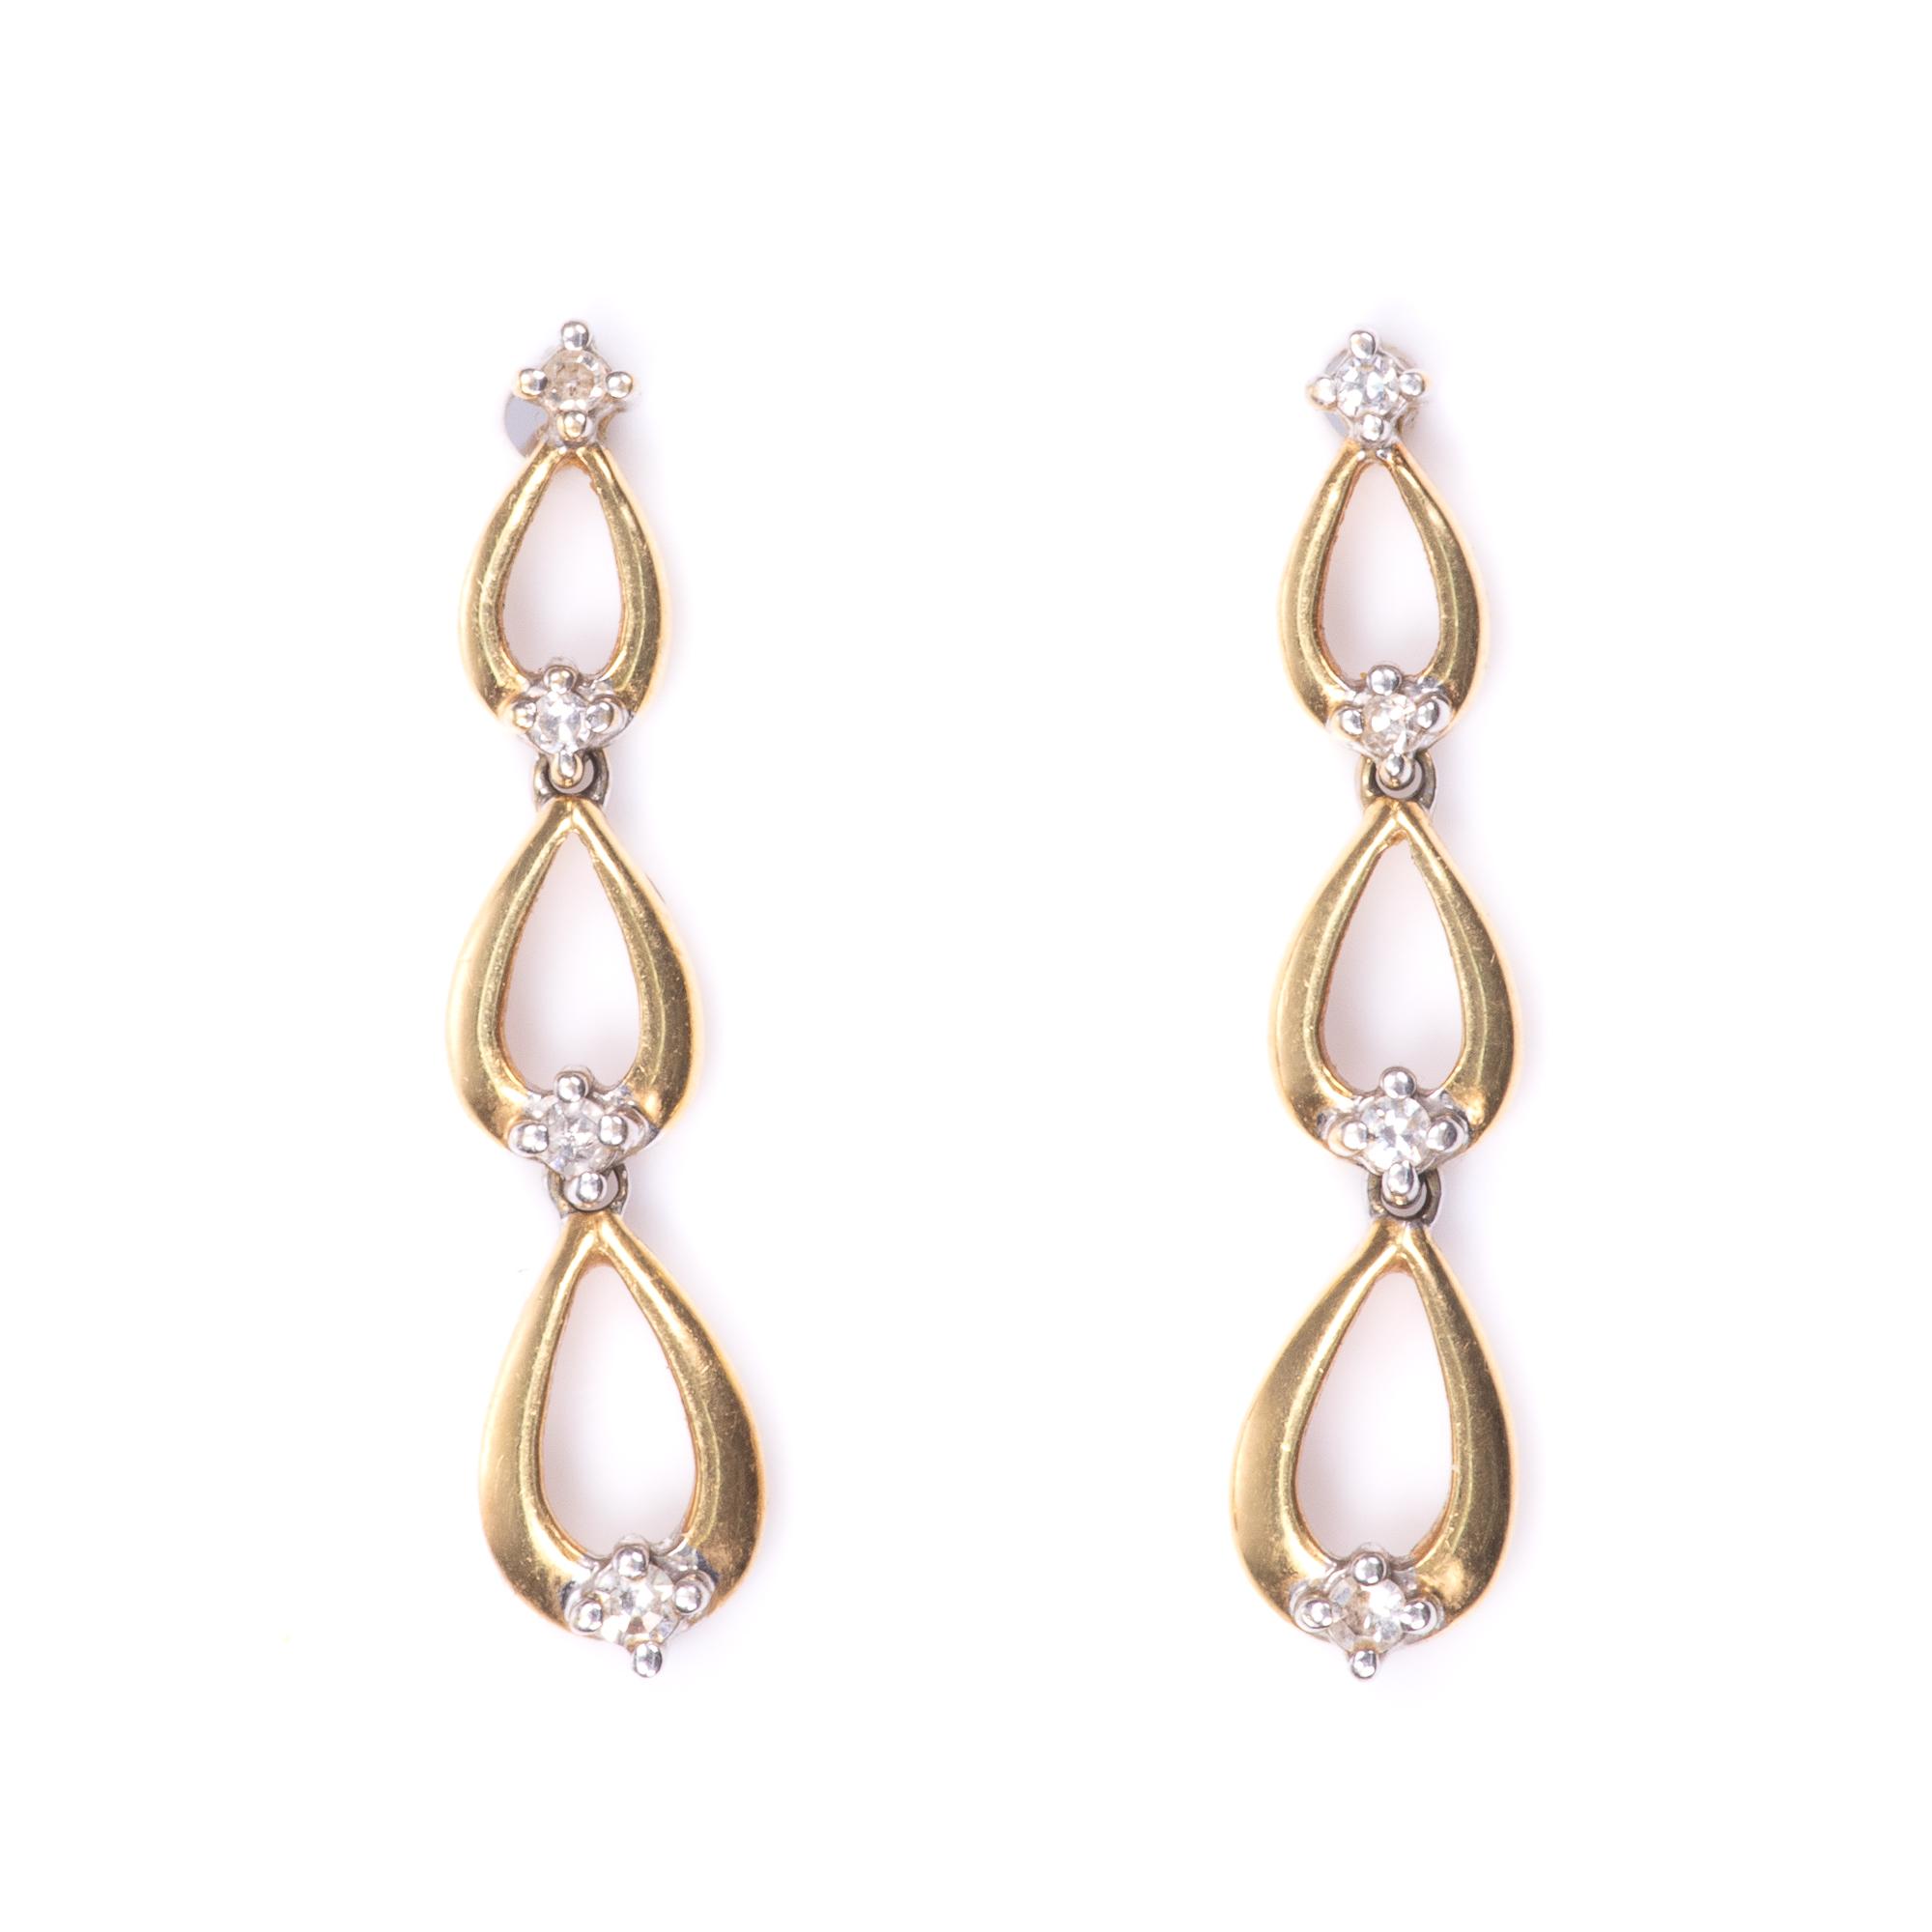 18ct Gold Diamond Earrings